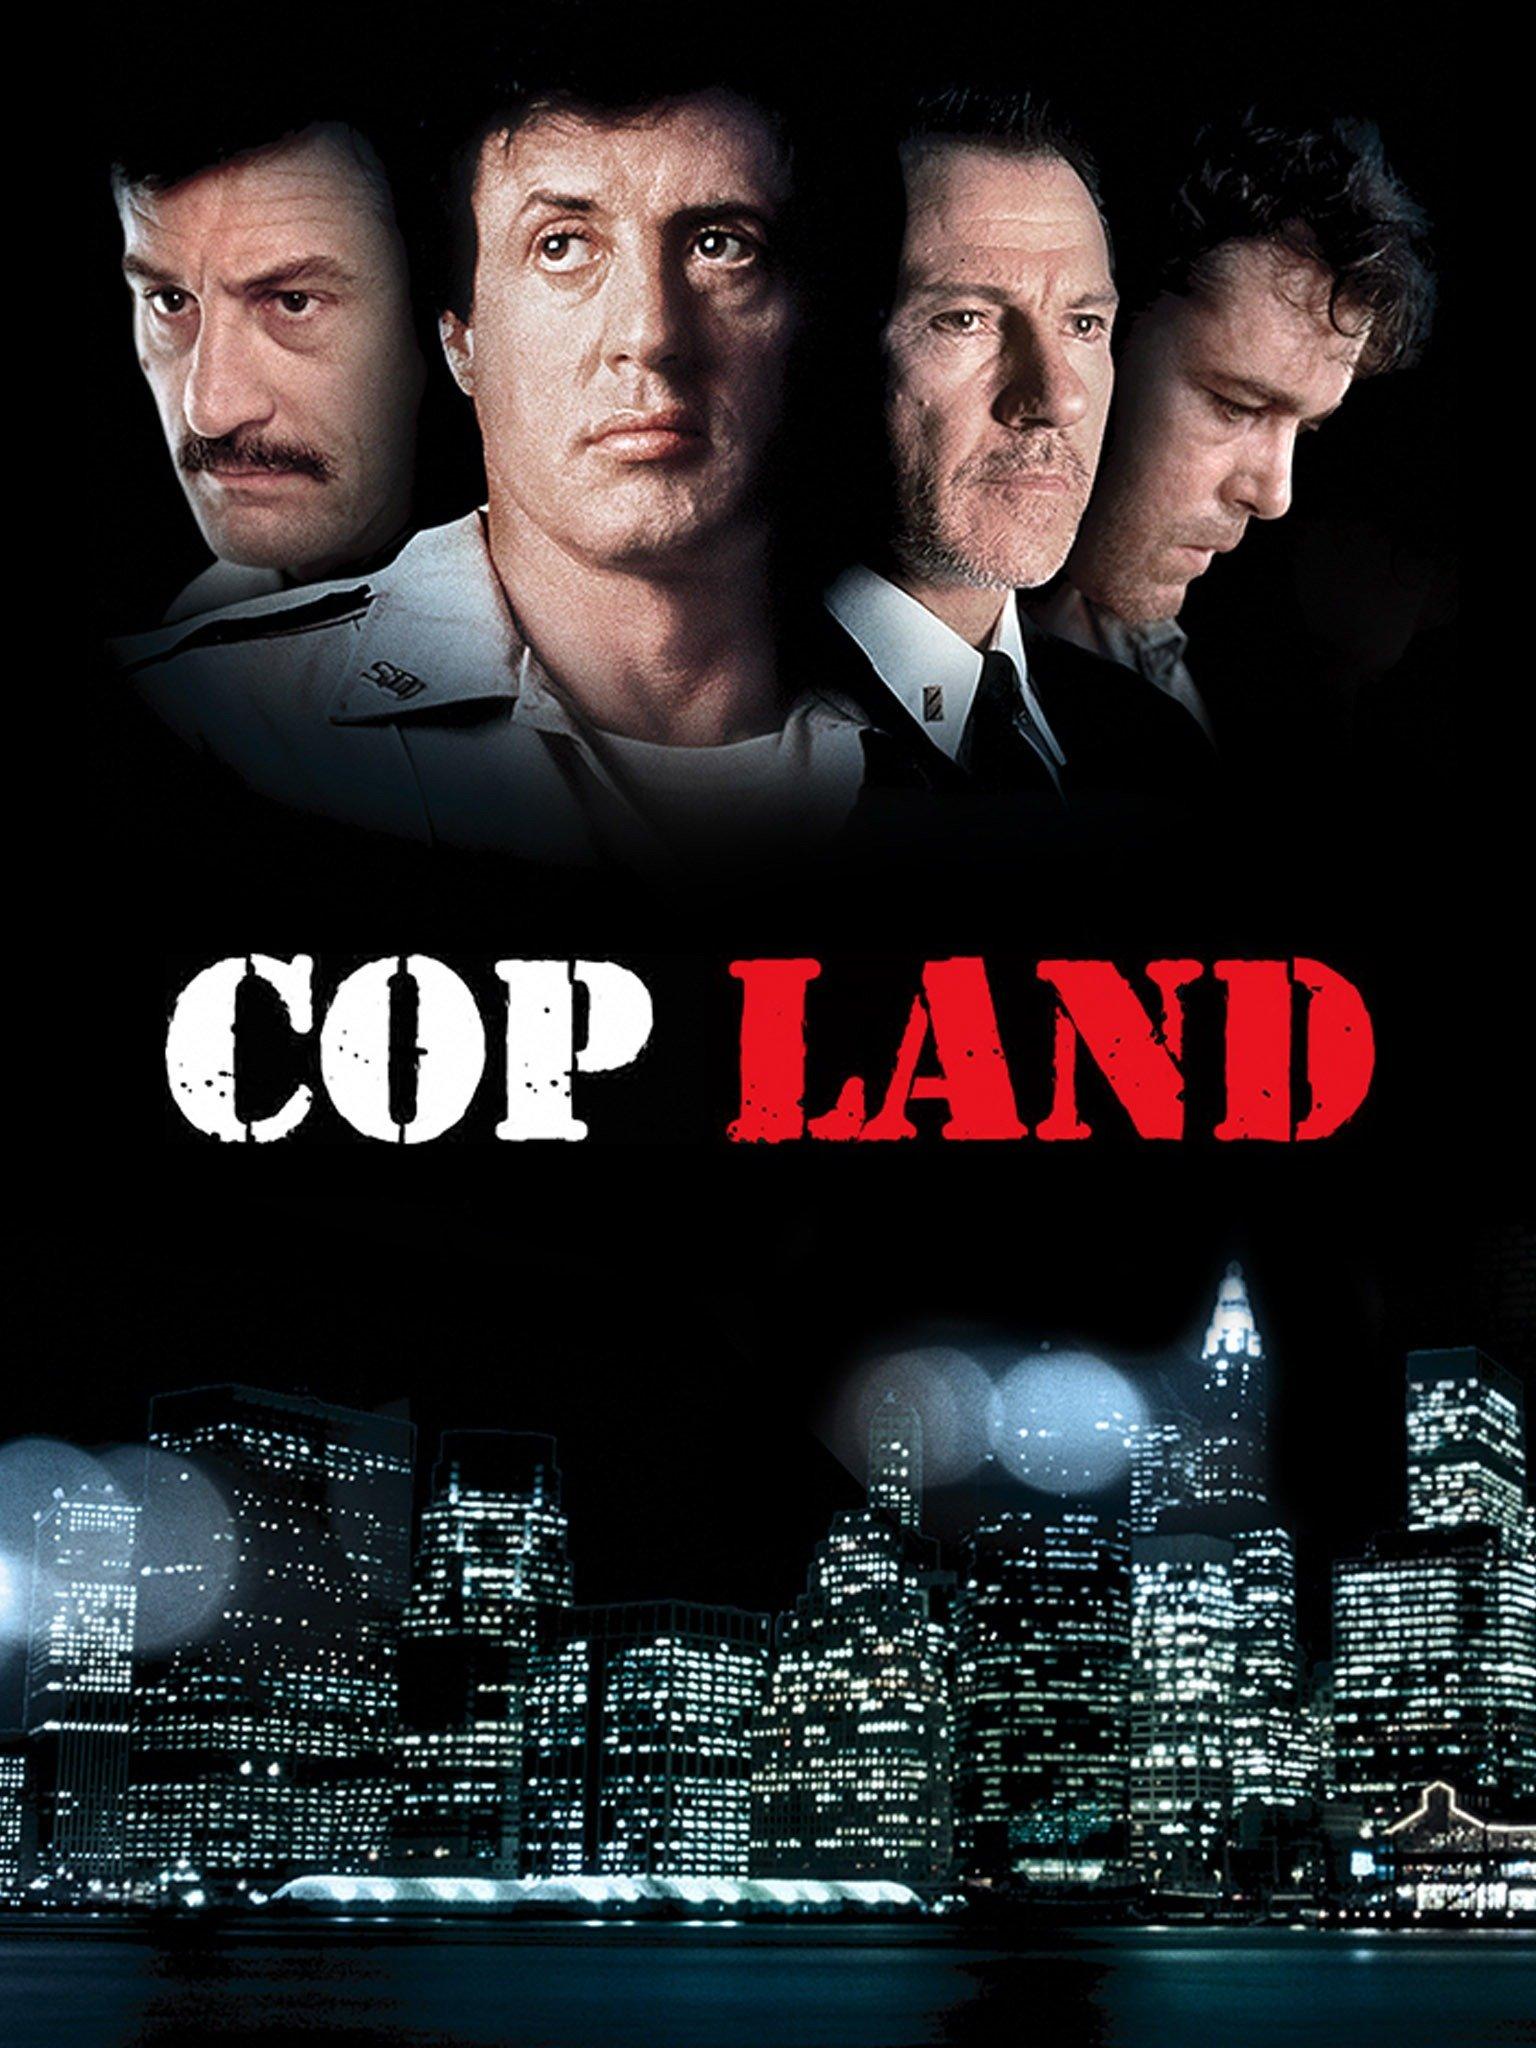 Cop Land Movie Reviews